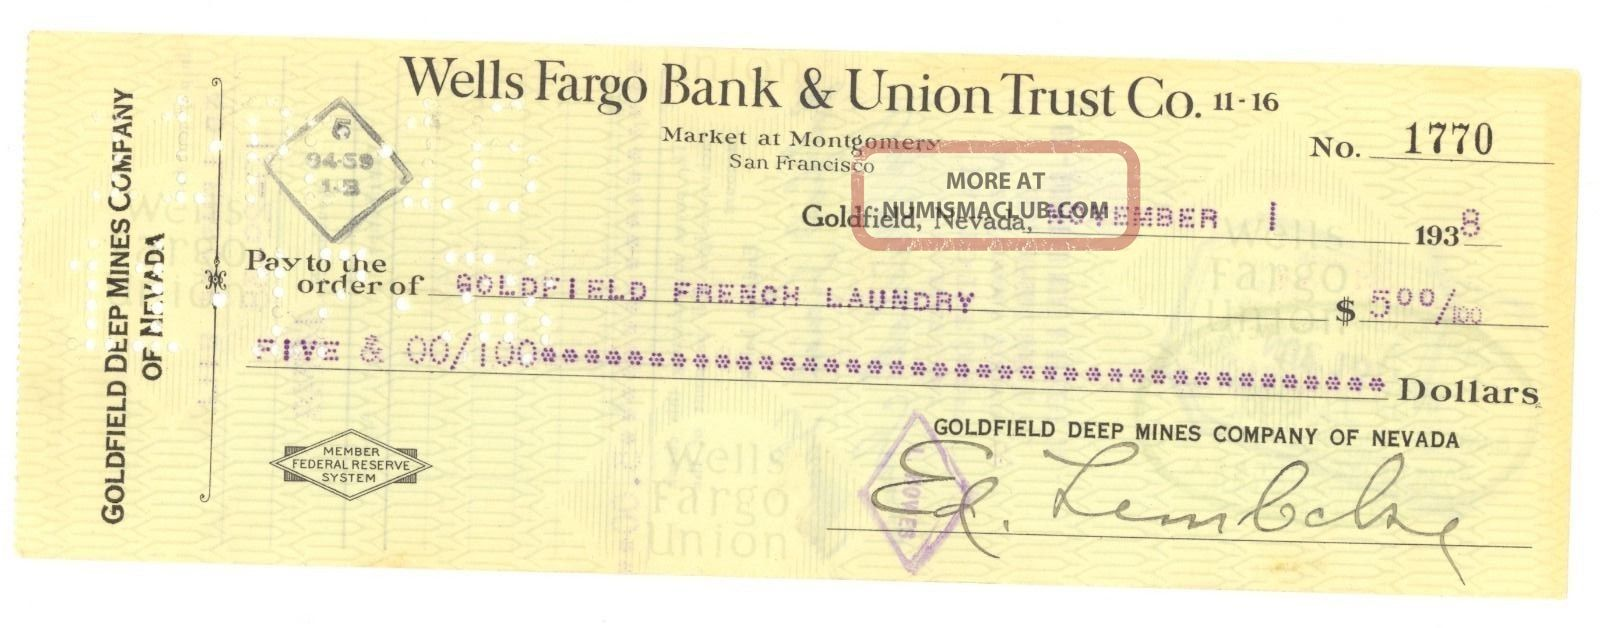 1938 Goldfield Deep Mines Co.  Of Nevada - Check 1770 - Goldfield,  Nevada Stocks & Bonds, Scripophily photo